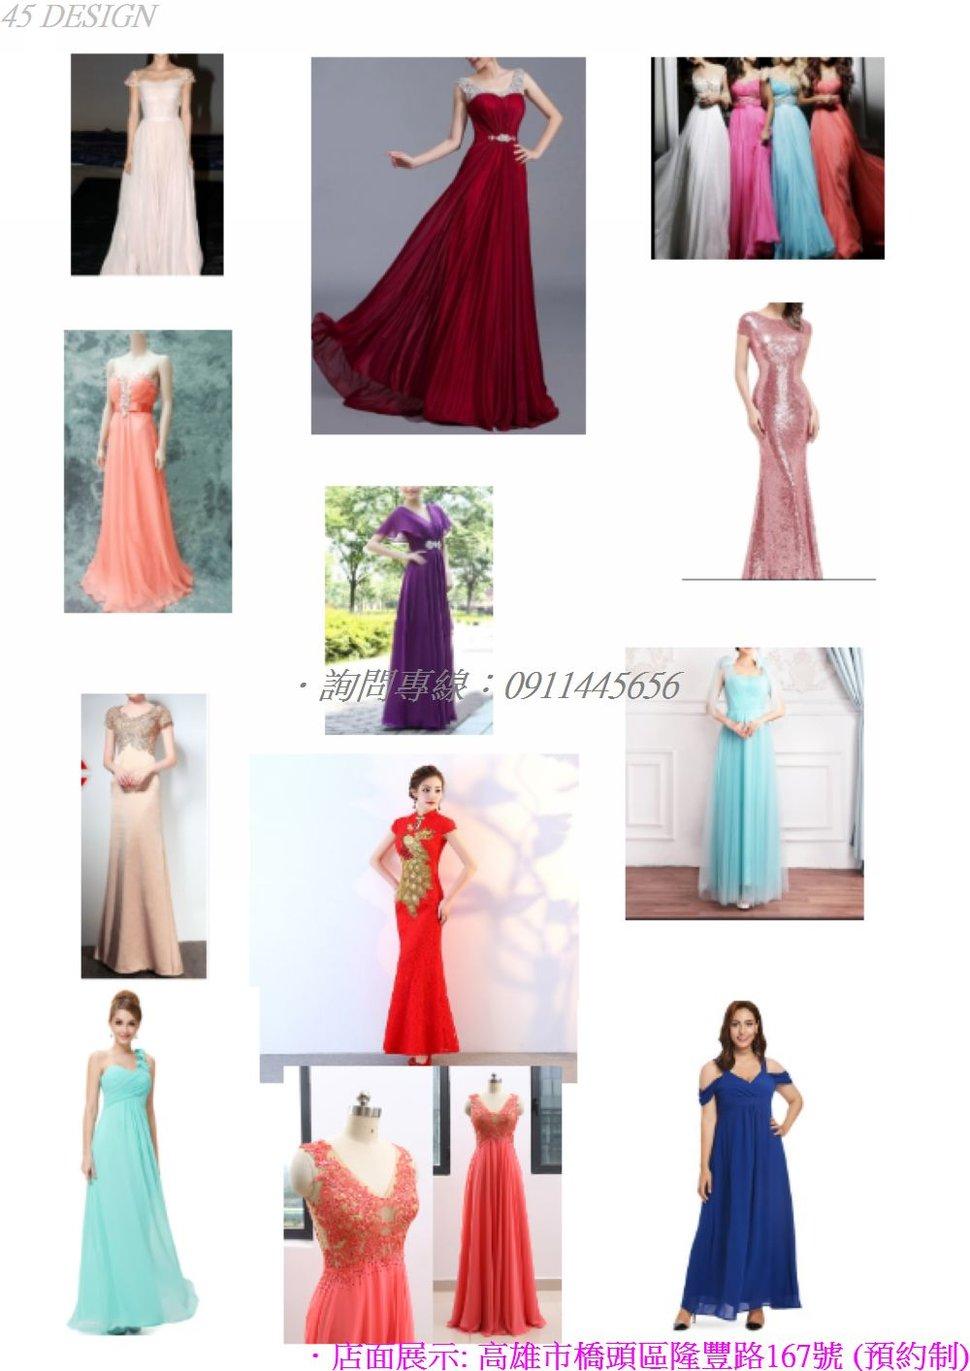 msl19081545478A63A4C44895B7E76CE63DDDC68D - 全台最便宜-45DESIGN四五婚紗禮服《結婚吧》